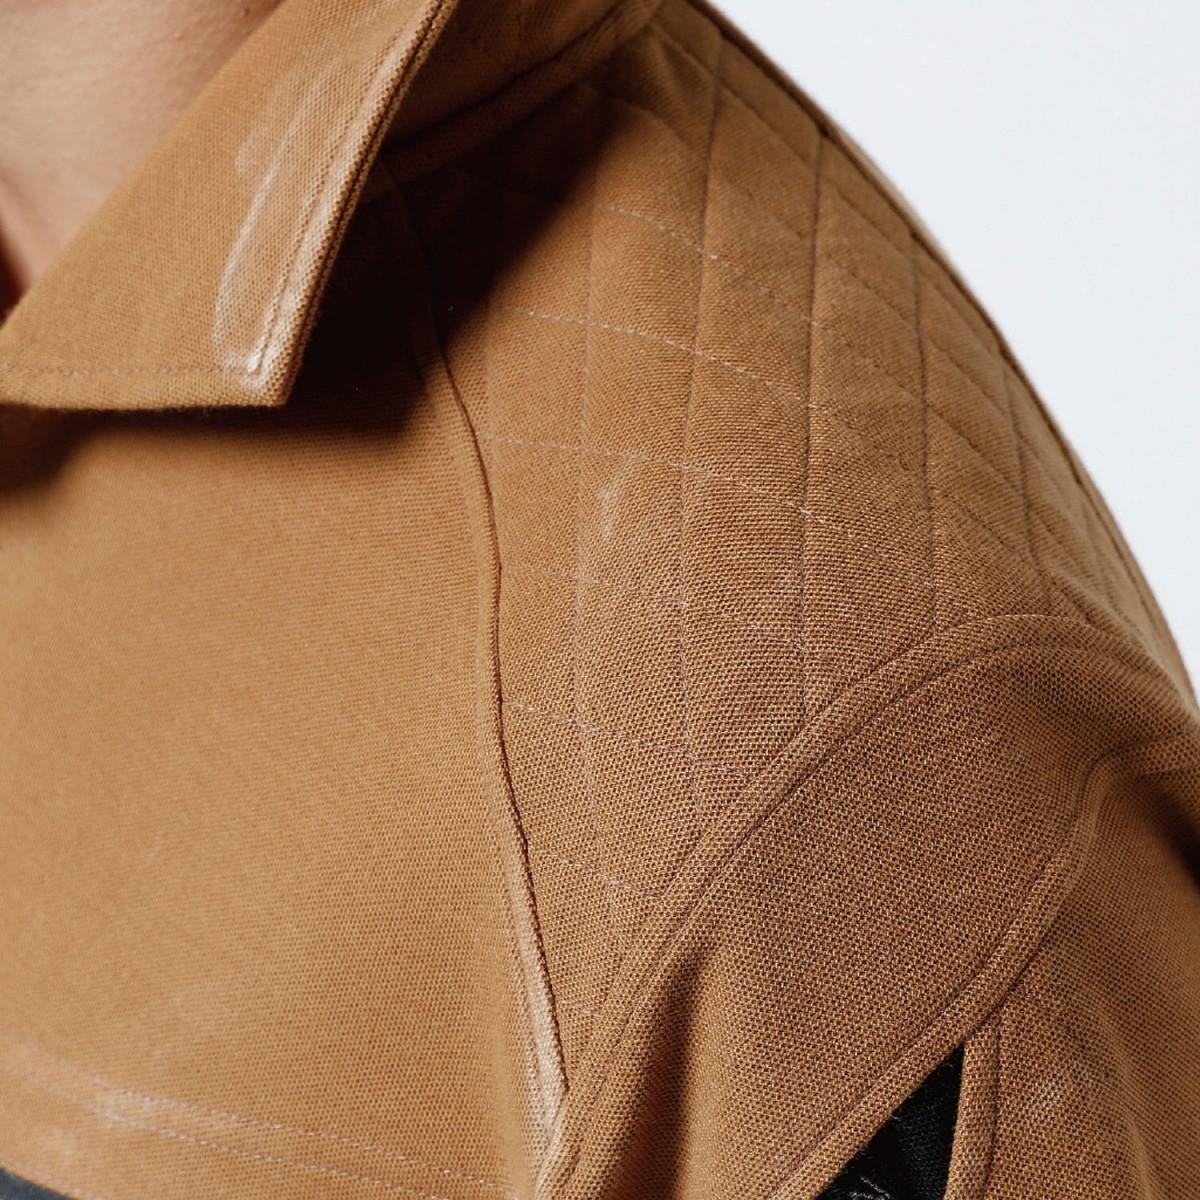 TS DESIGN~TSデザイン~5015 ワークニットロングポロシャツ 肩刺し子仕様。